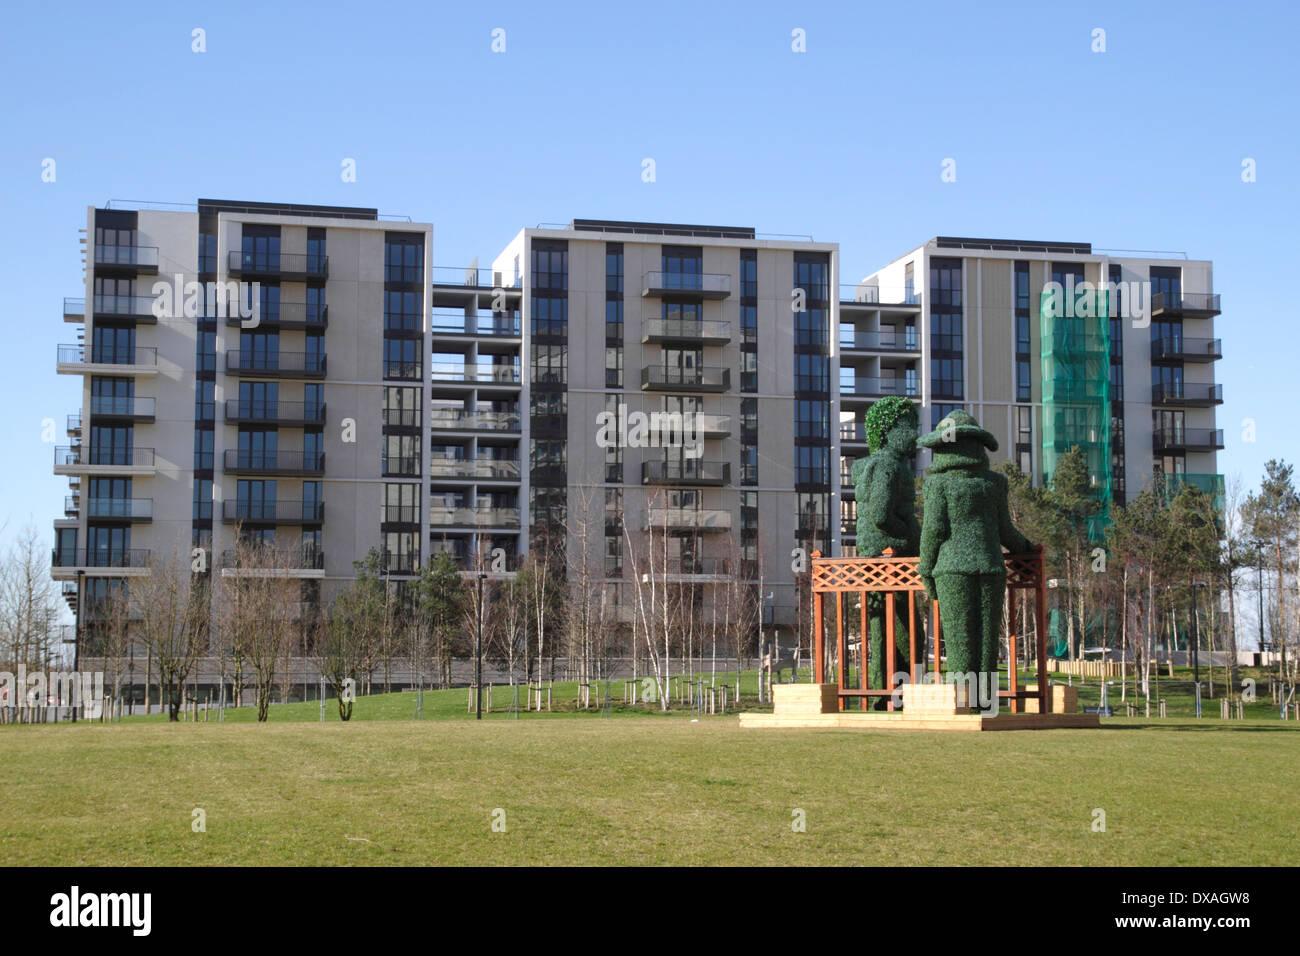 neue wohnungen east village olympic park stratford london stockfoto bild 67844932 alamy. Black Bedroom Furniture Sets. Home Design Ideas